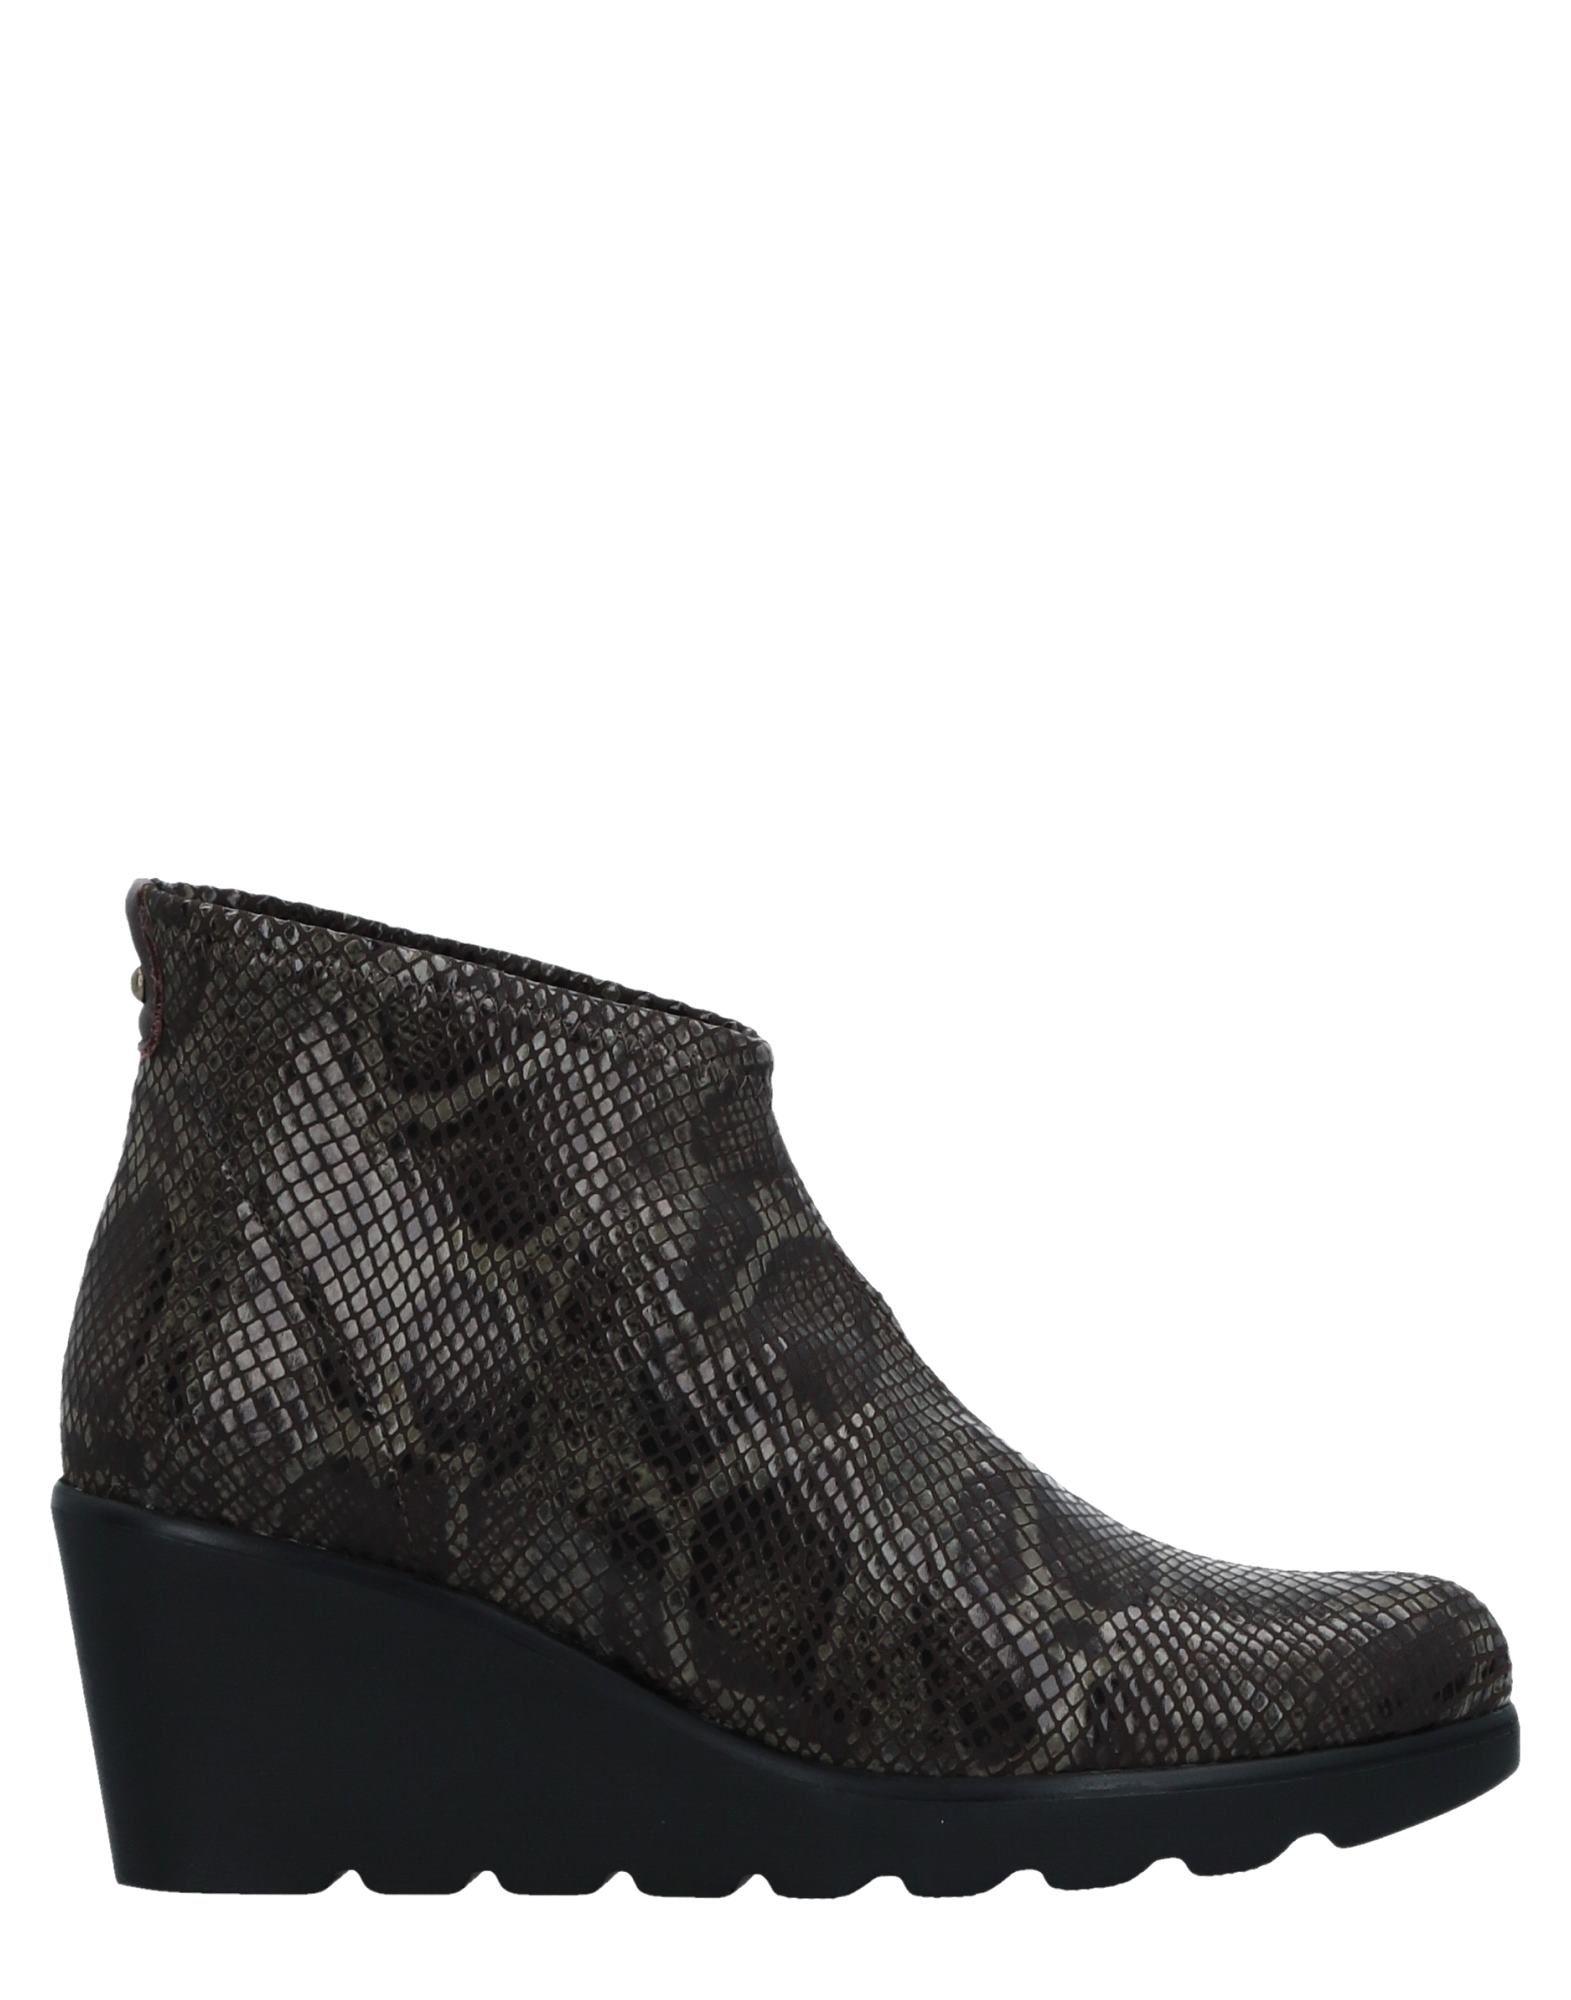 Toni Pons Stiefelette Damen  11517231DC Gute Qualität beliebte Schuhe